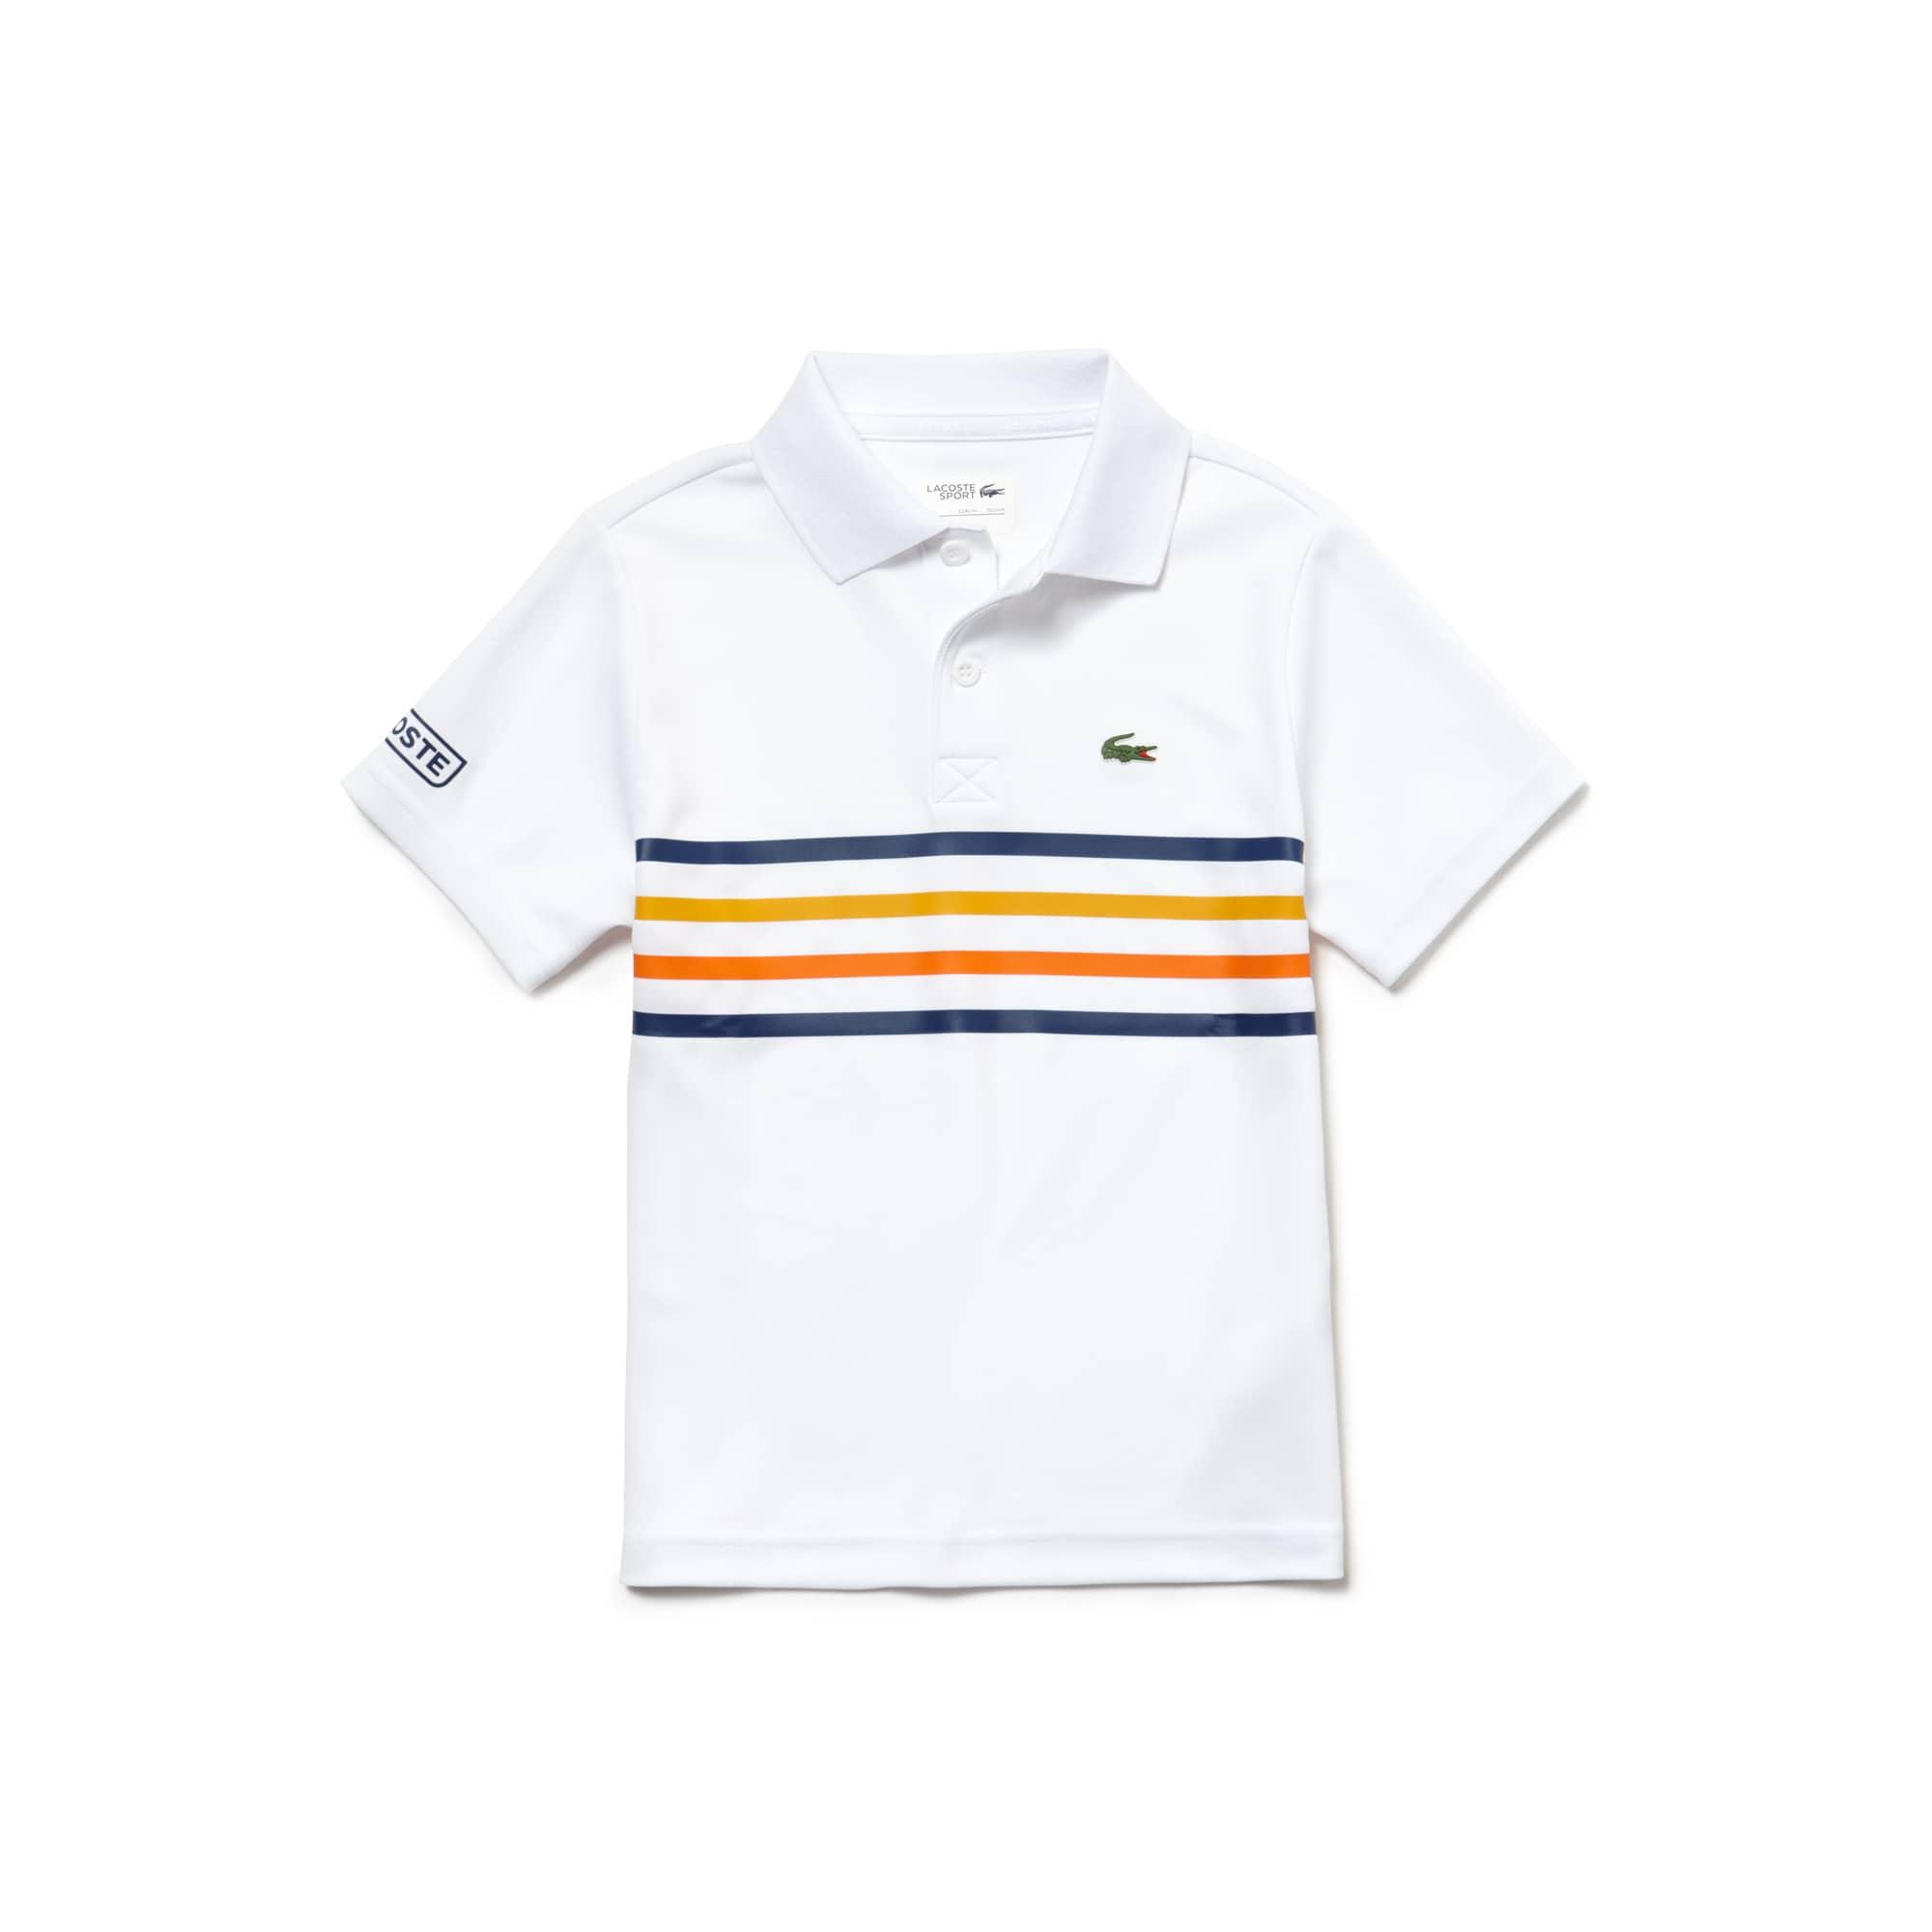 6c111f9a9f72eb Boys  Lacoste SPORT Colored Bands Tech Piqué Tennis Polo Shirt ...